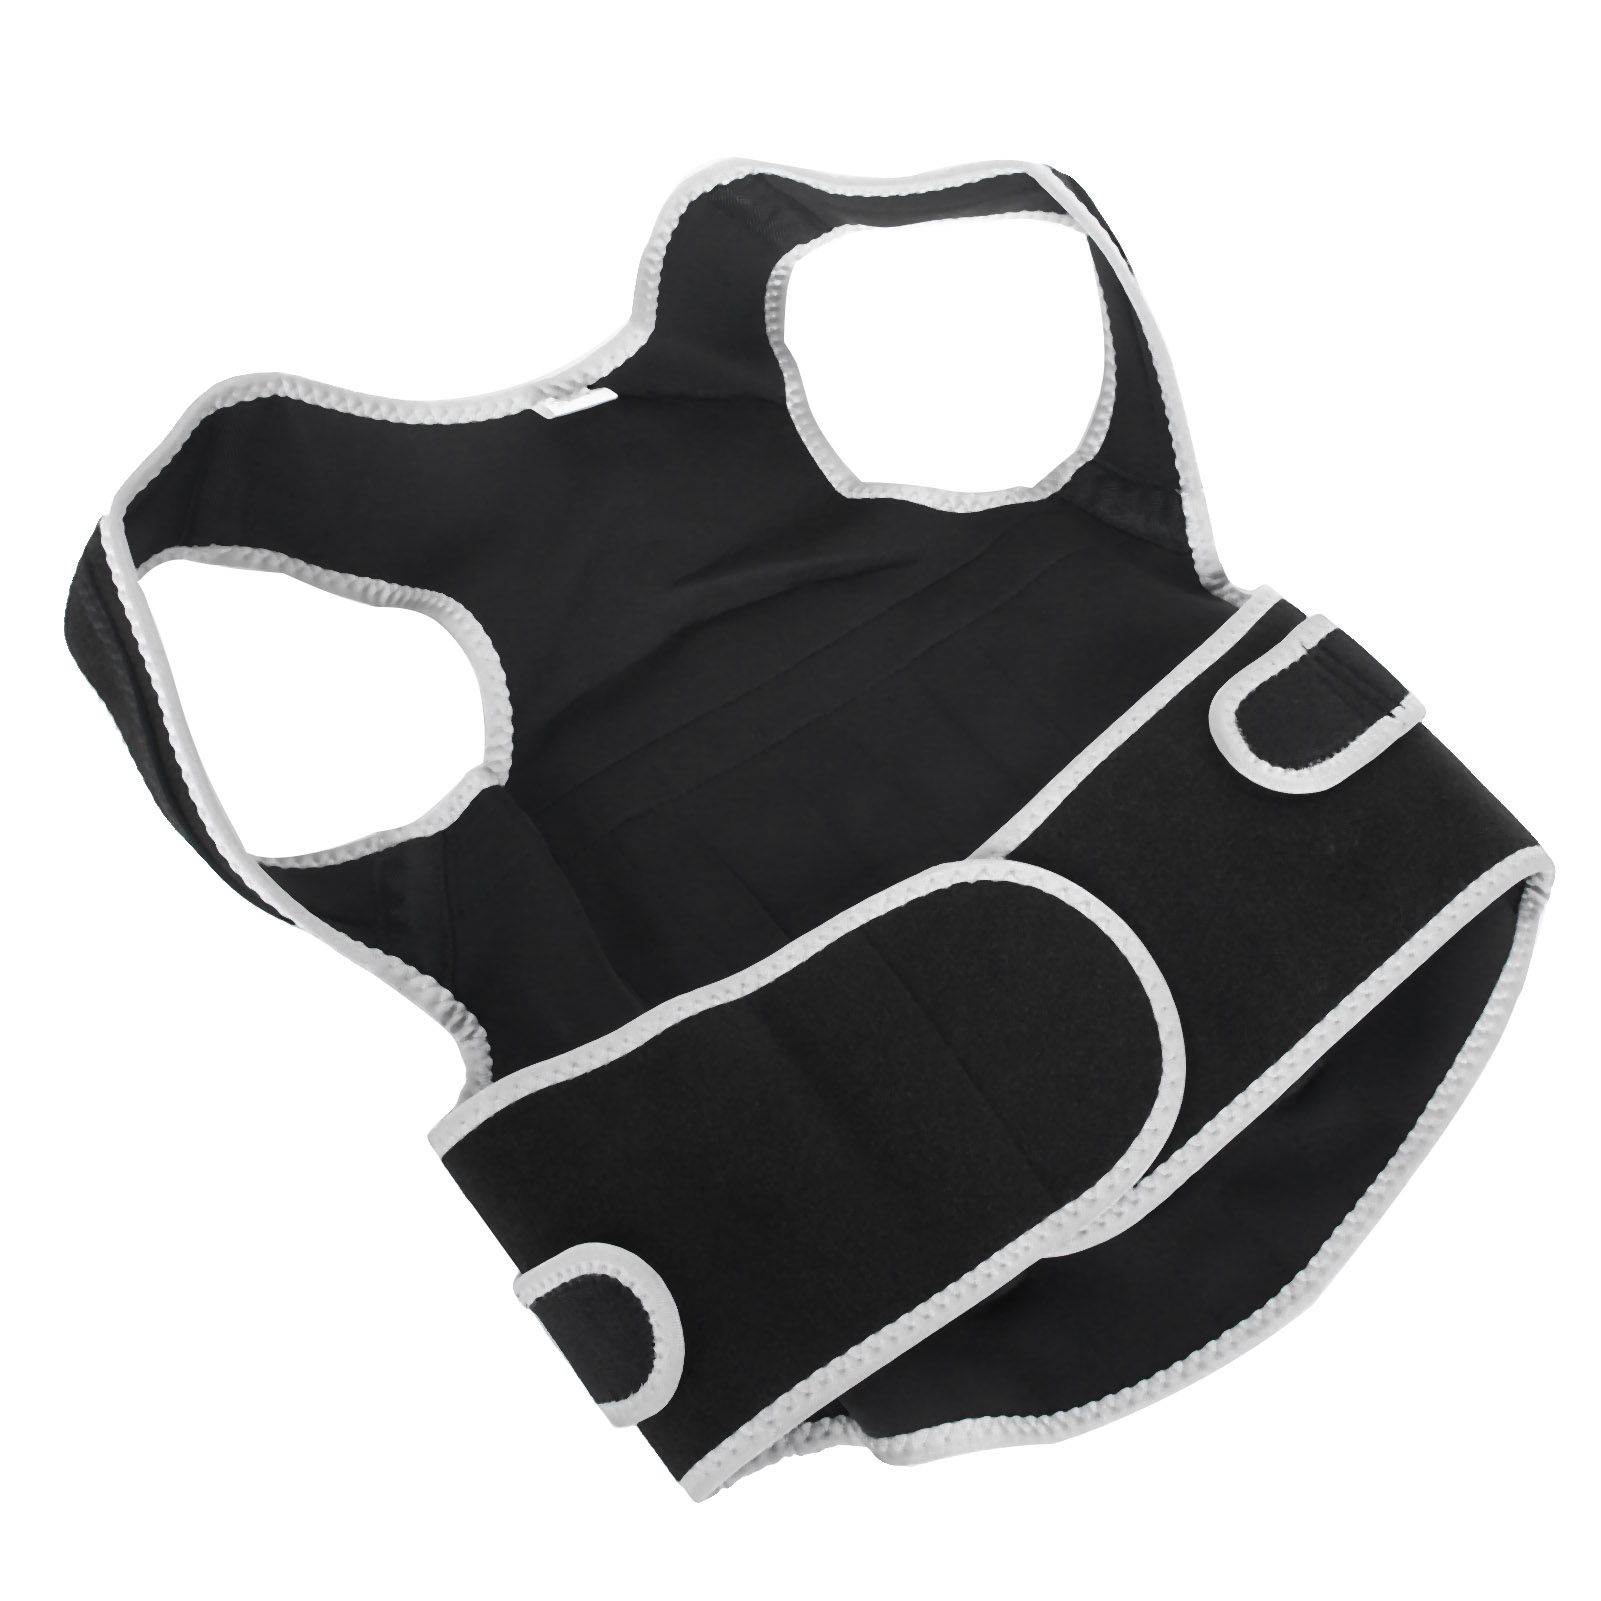 Posture-Corrector-Breathable-Back-Waist-Spine-Support-Belt-Brace-Straightener-GL thumbnail 18